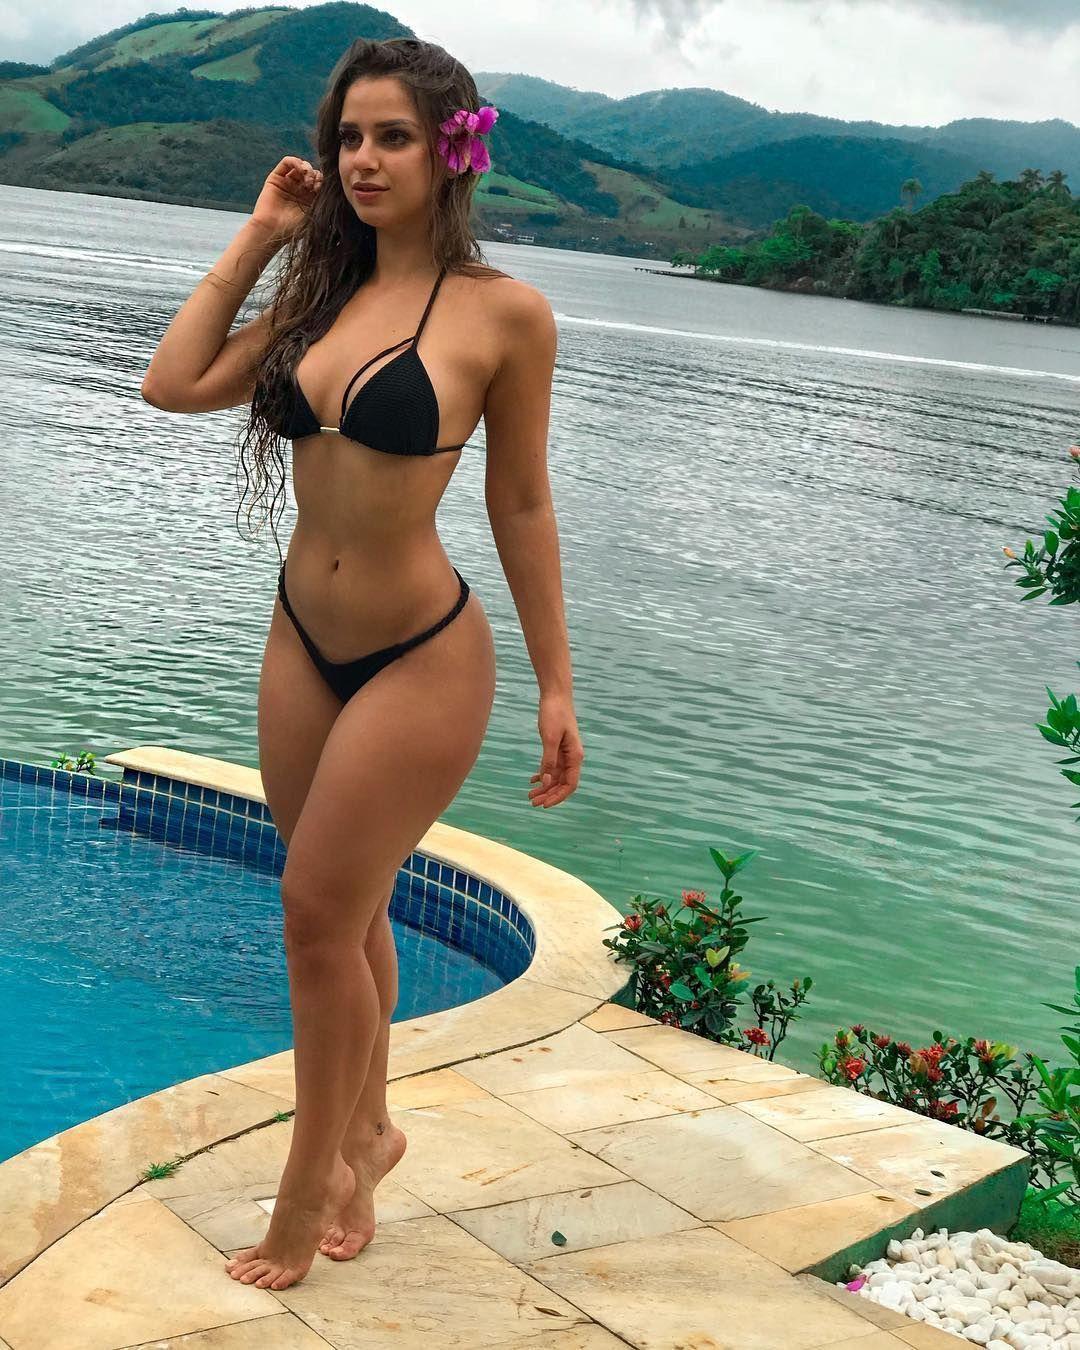 Big booty tan girls gif final, sorry